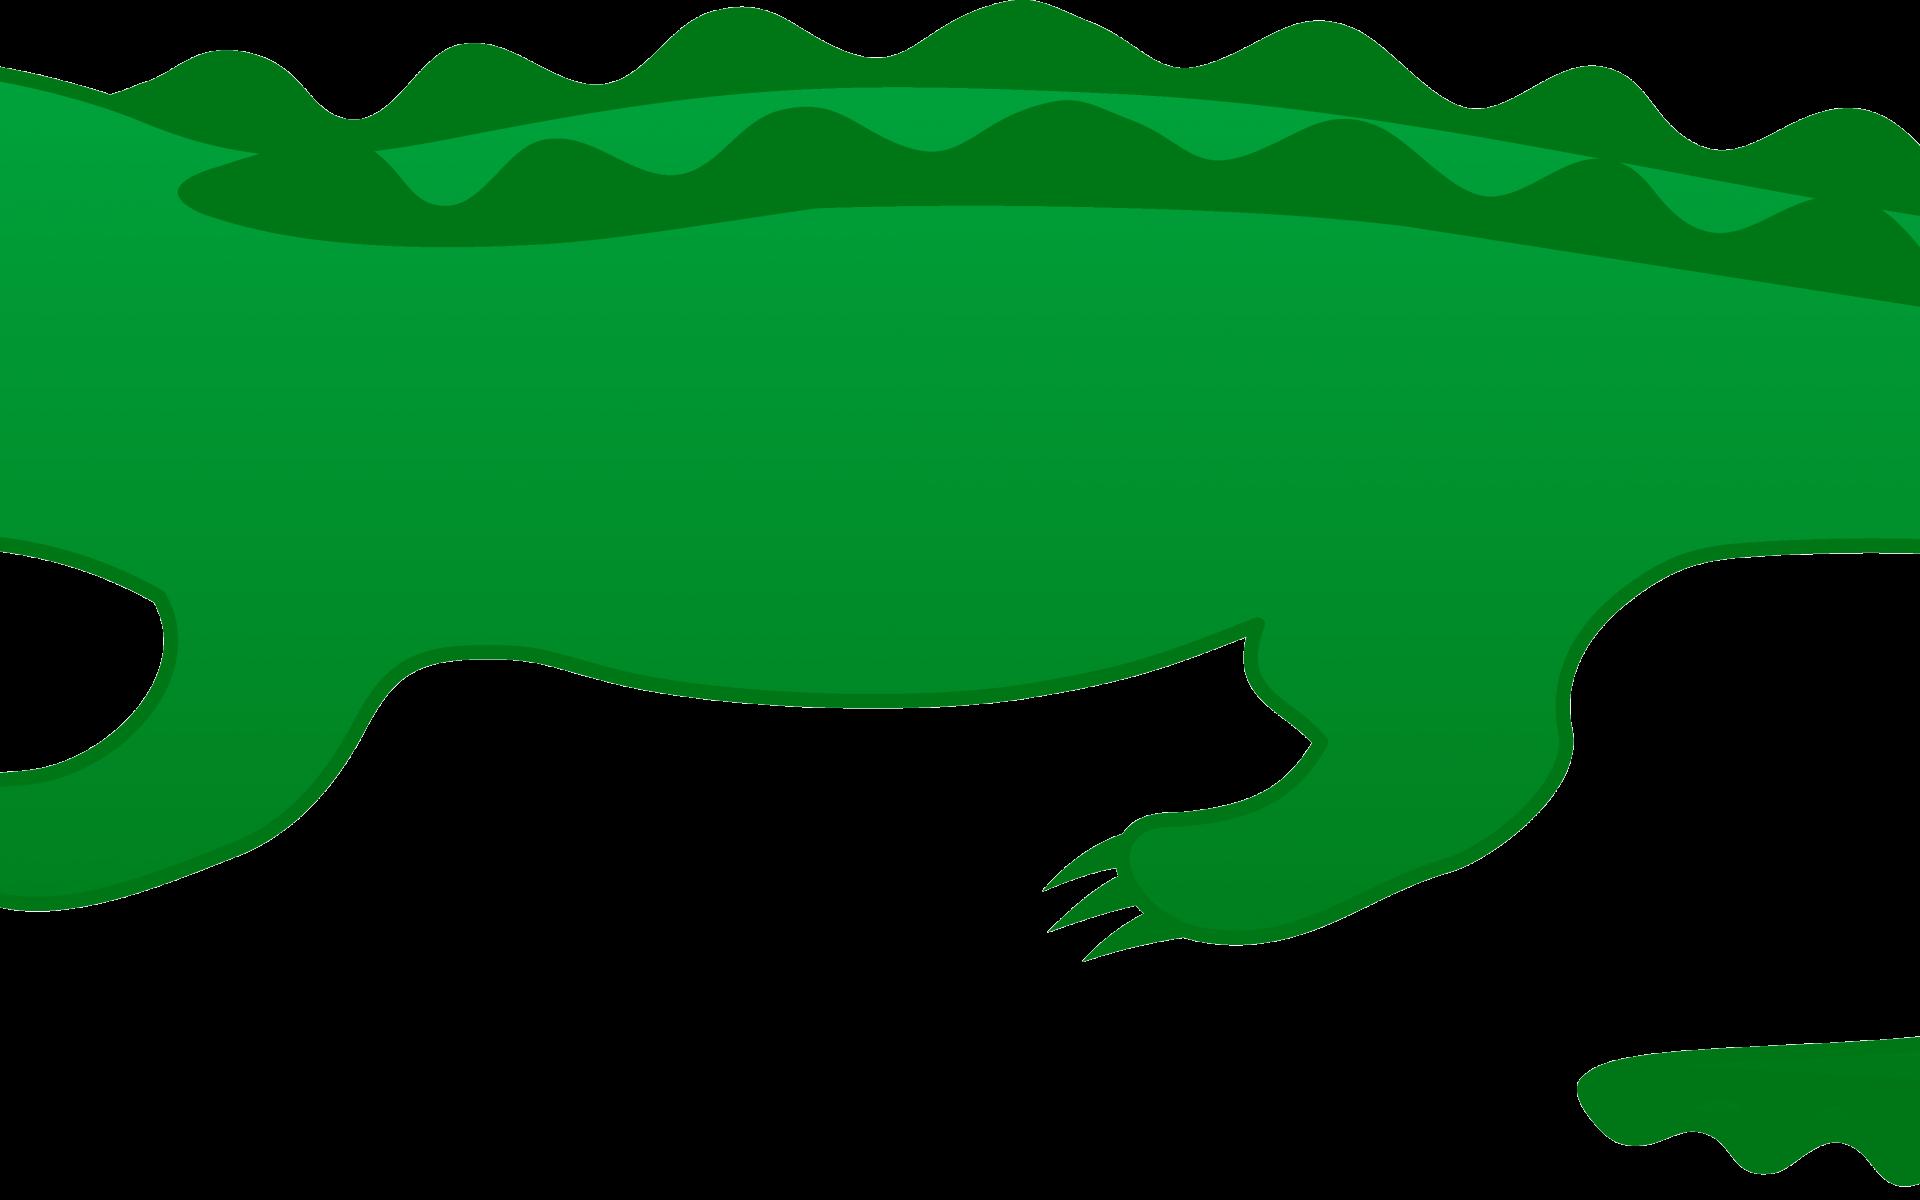 alligator cool cartoon. Gator clipart great